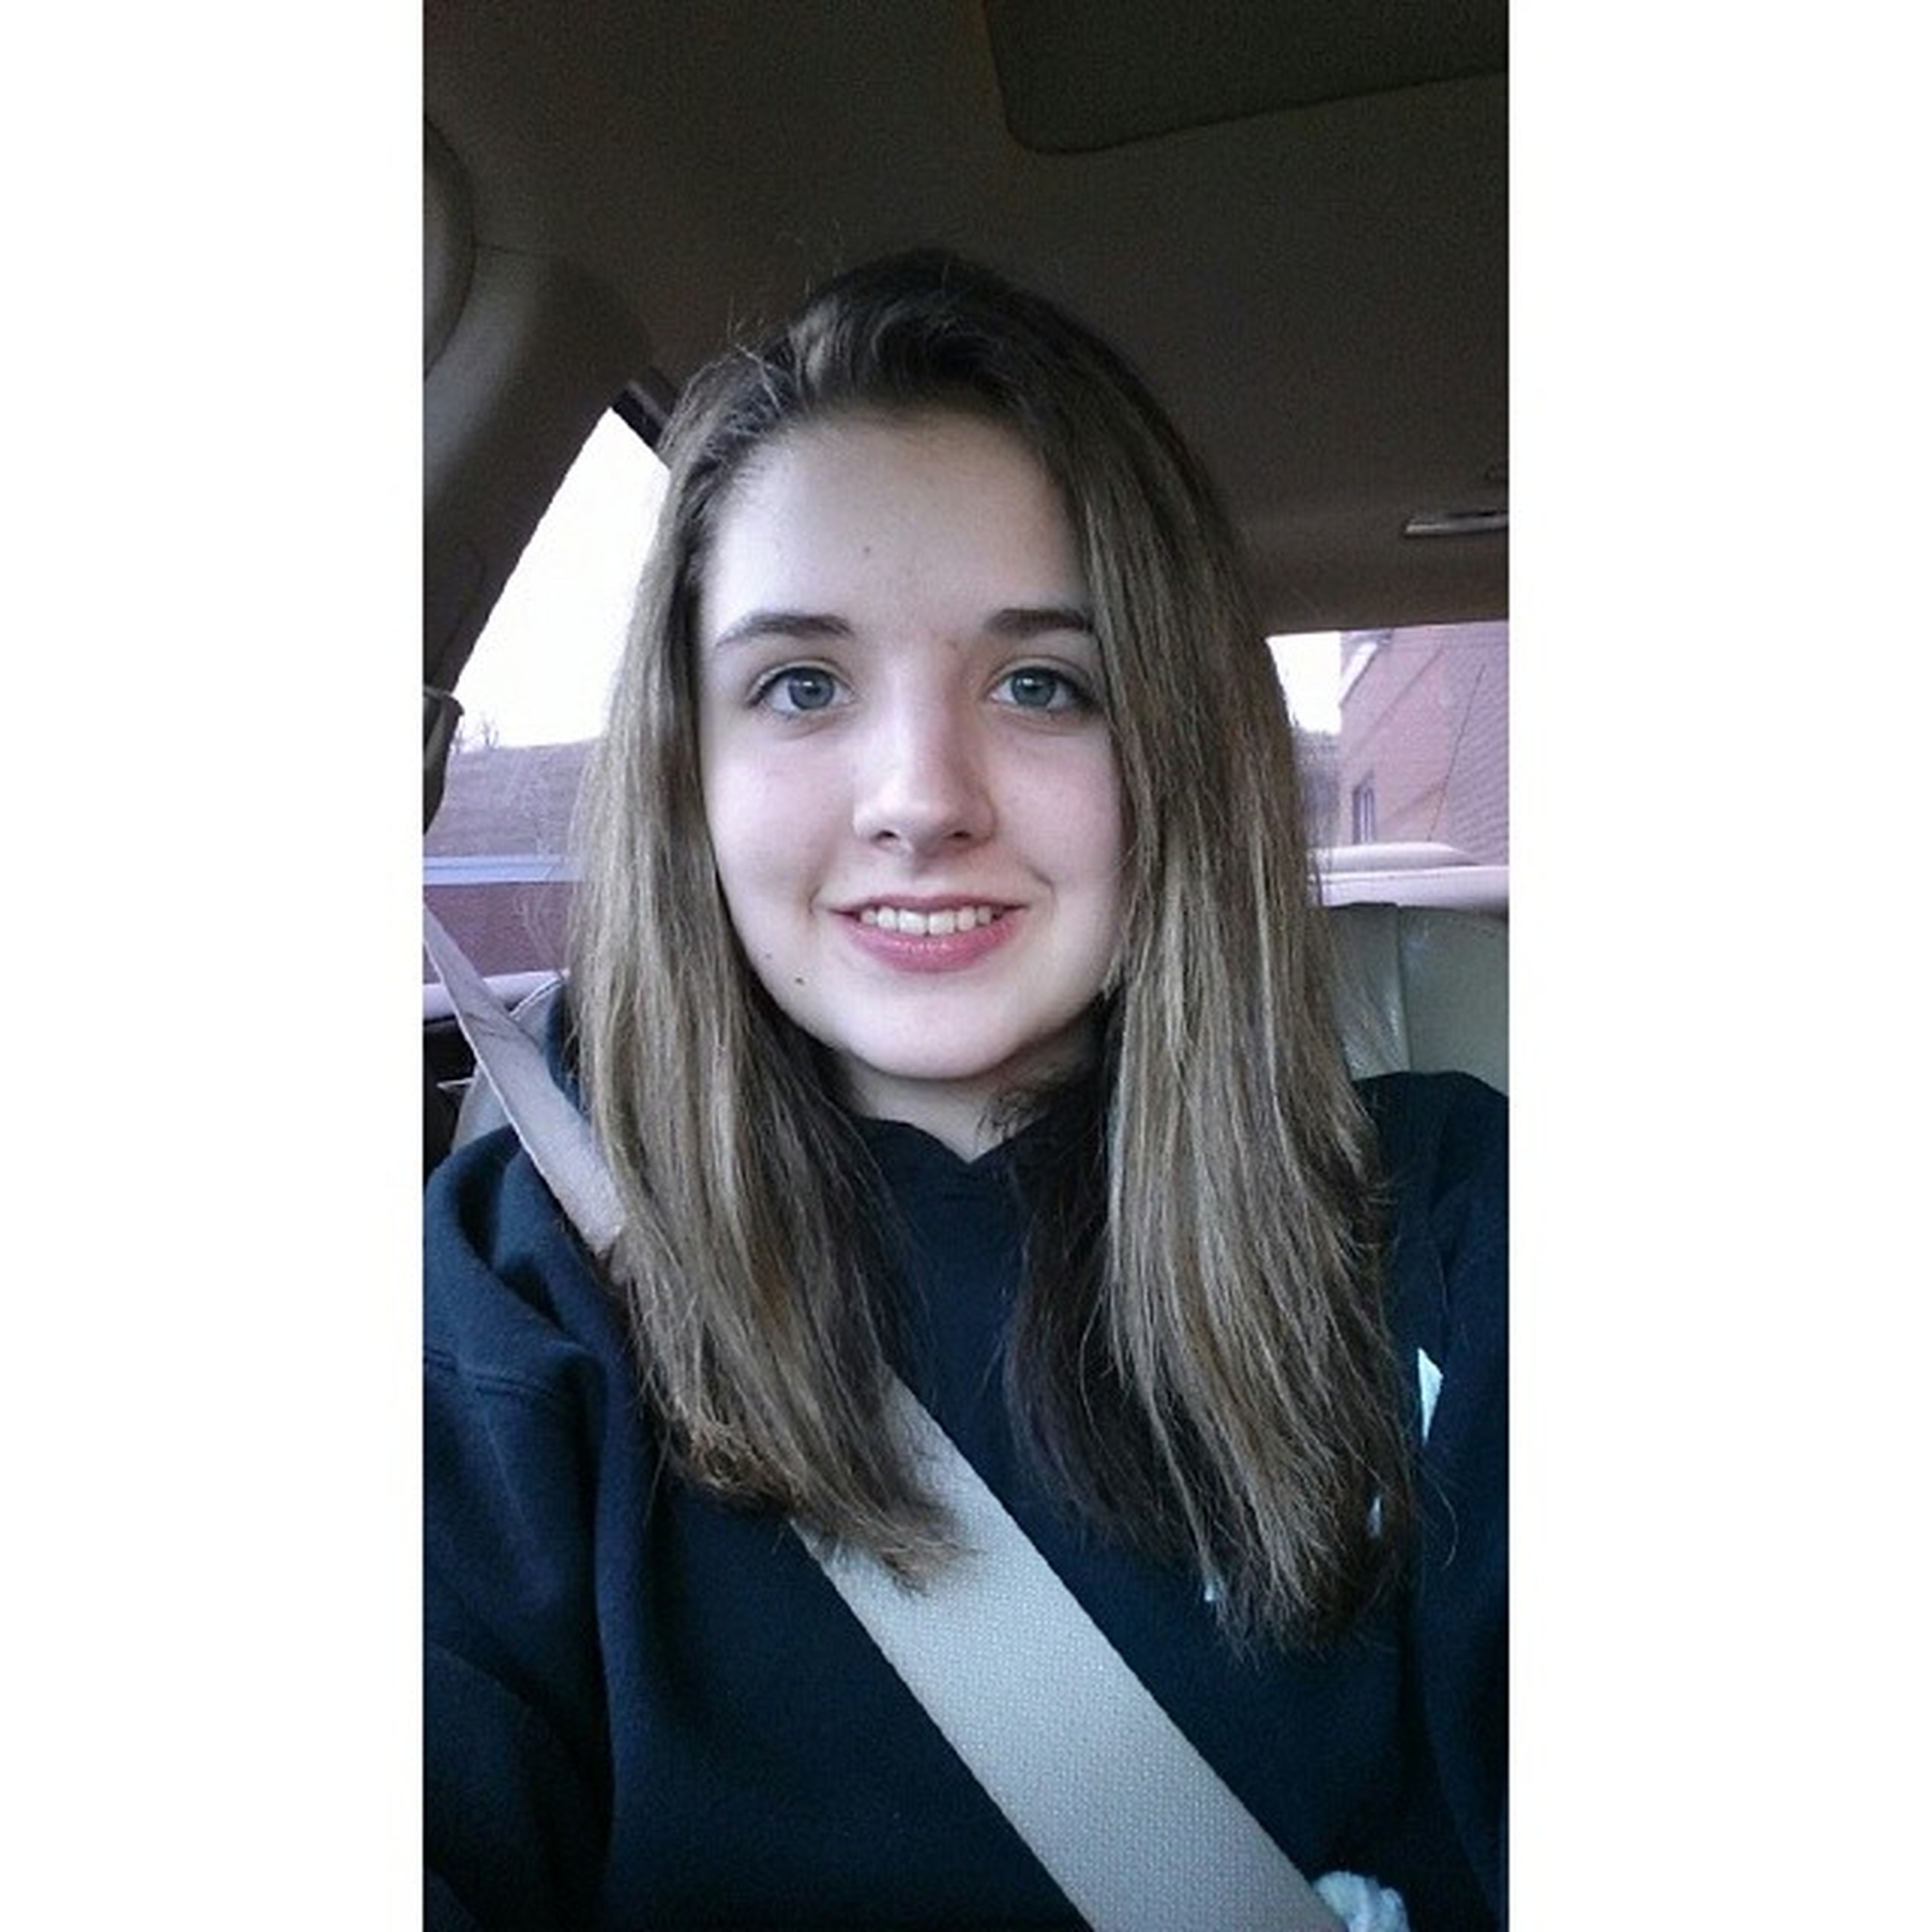 A smile for a smile. Bracesoff Badselfie Goodselfie  ? livinglife afterschoolselfie